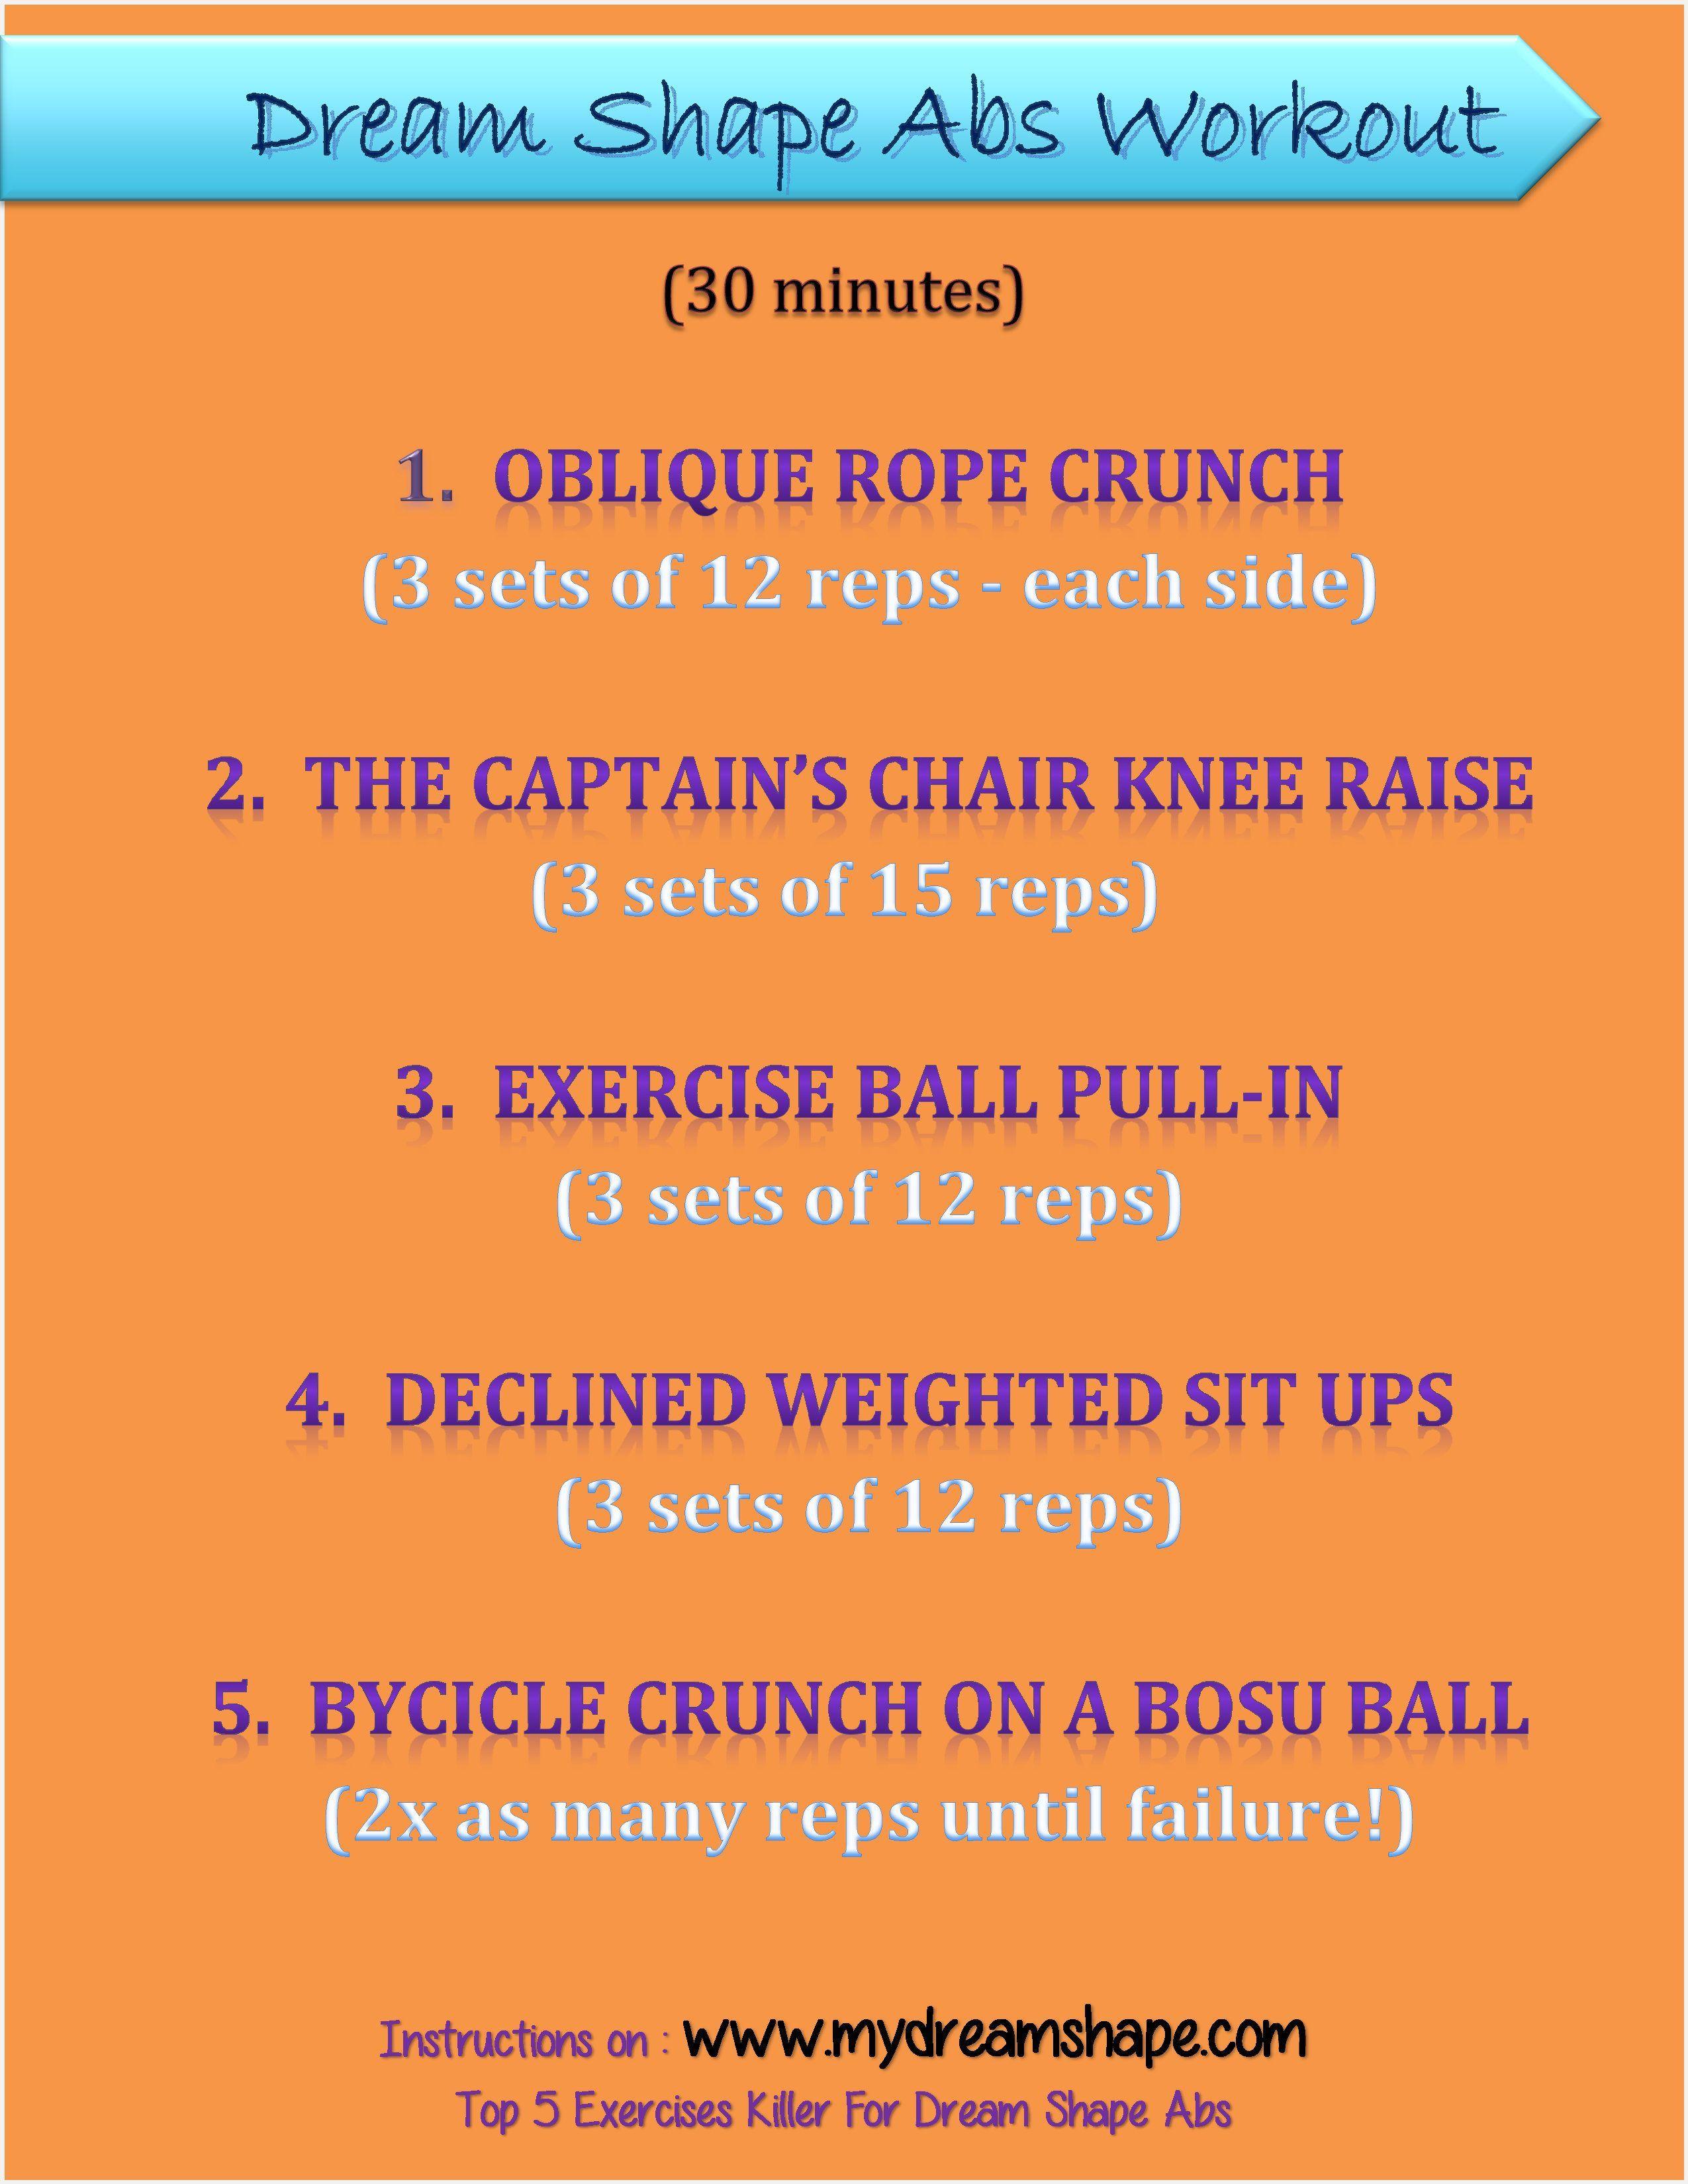 Dream Shape Abs Workout Oblique Rope Crunch The Captain S Chair